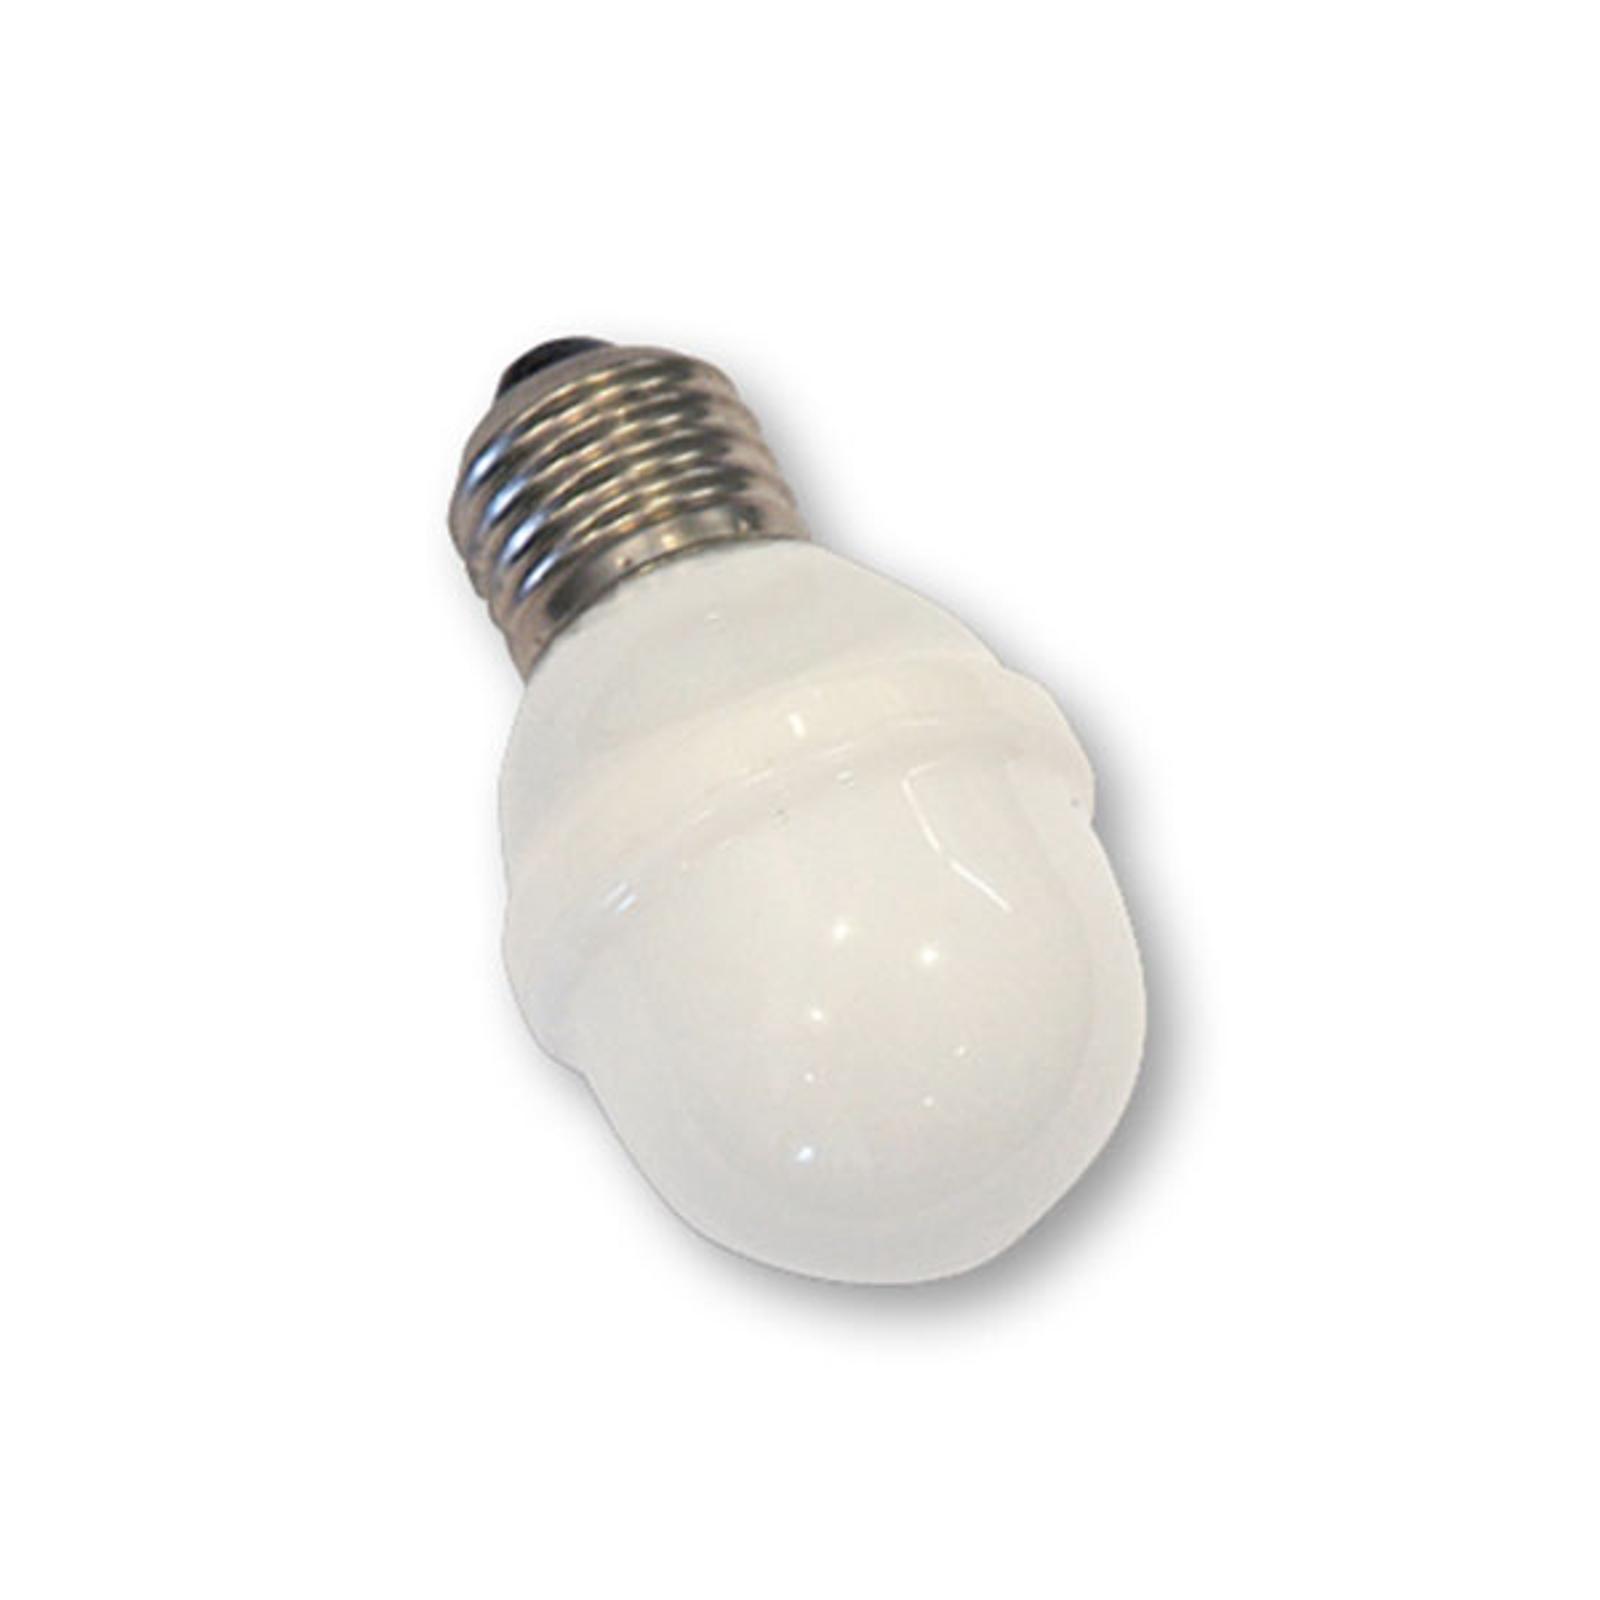 E27 Golfball-Lampe 1W 5,5 VA tageslicht